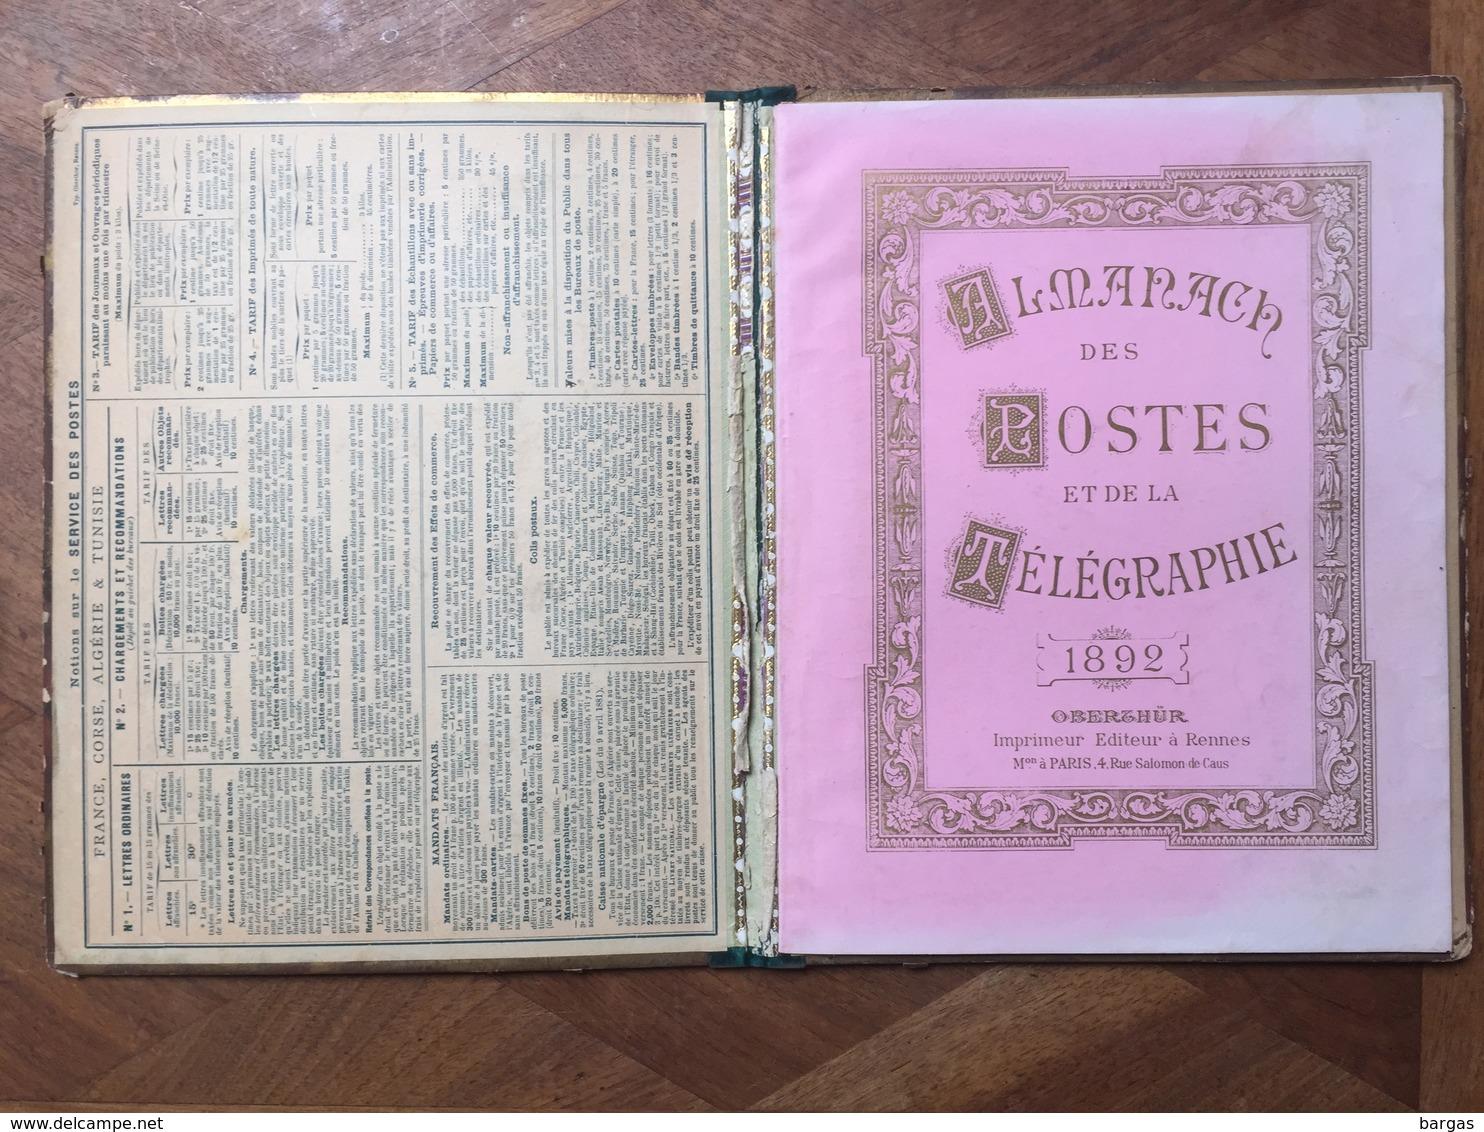 Calendrier Farde ALMANACH DES POSTE ET TELEGRAPHES 1892 - Calendari